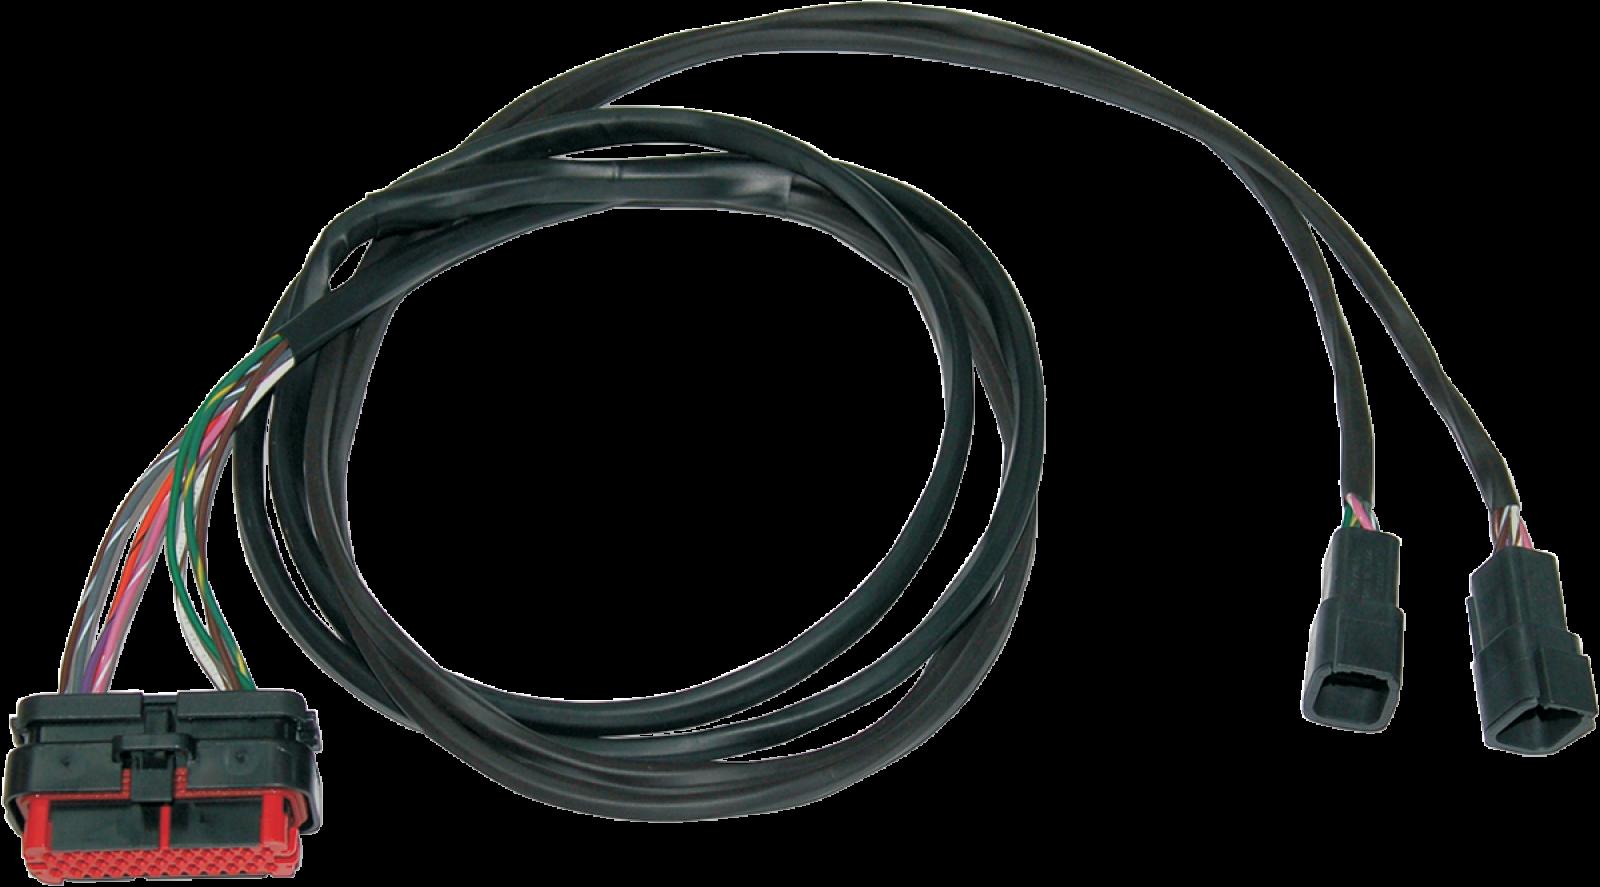 namz wiring harness rear speaker for harley davidson 2120 0770 each ebay